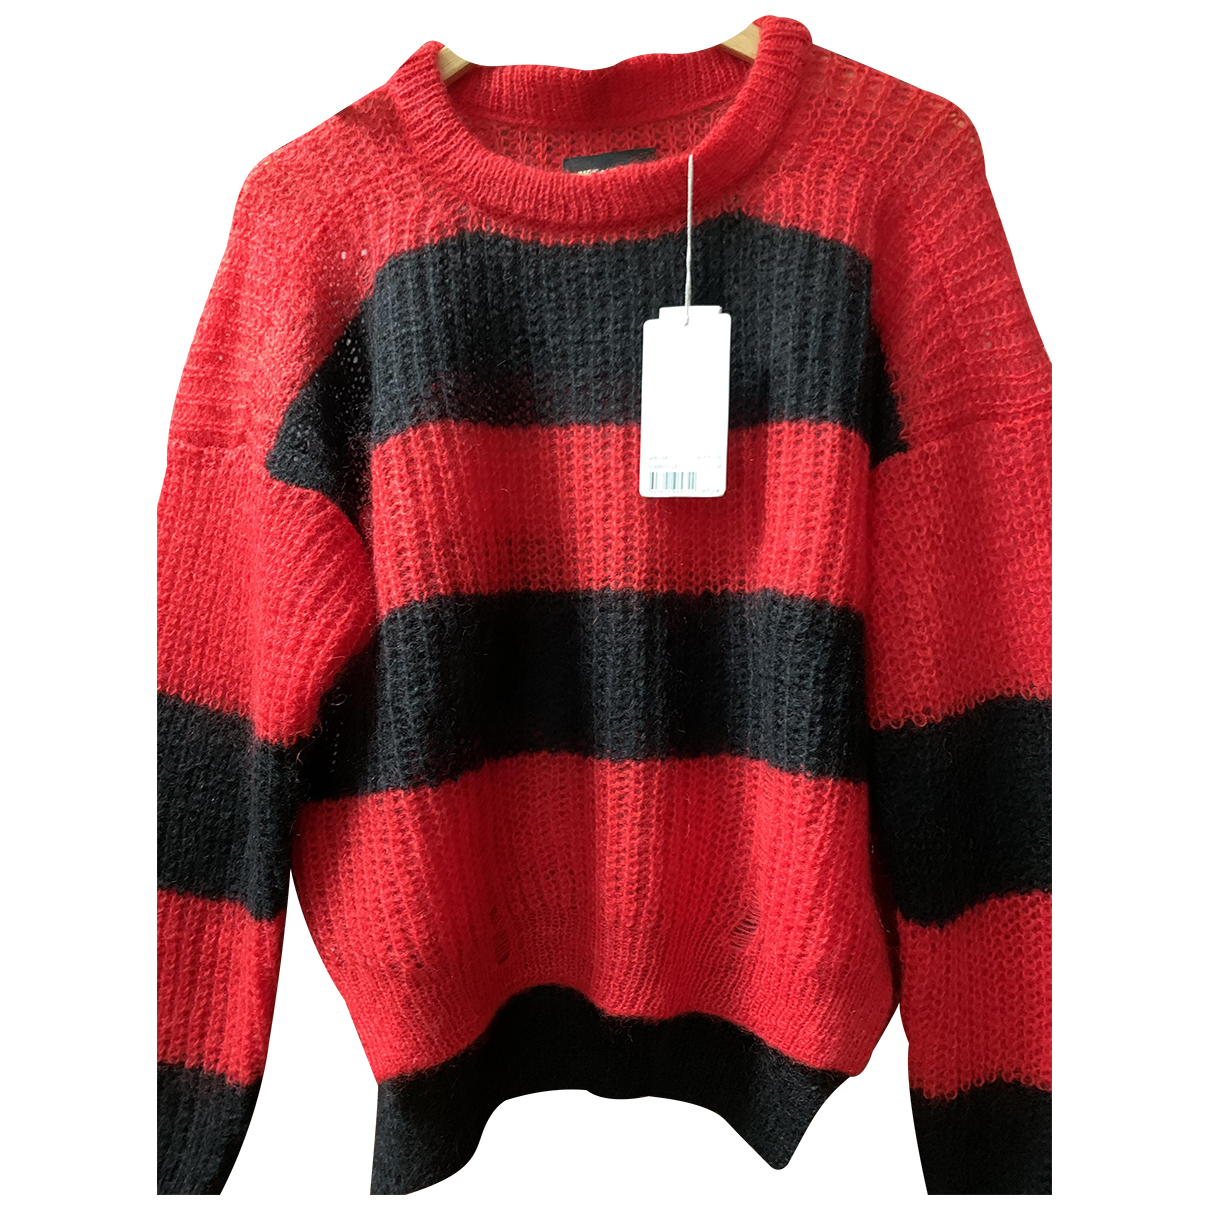 Zadig & Voltaire Fall Winter 2019 Multicolour Wool Knitwear for Women 38 FR